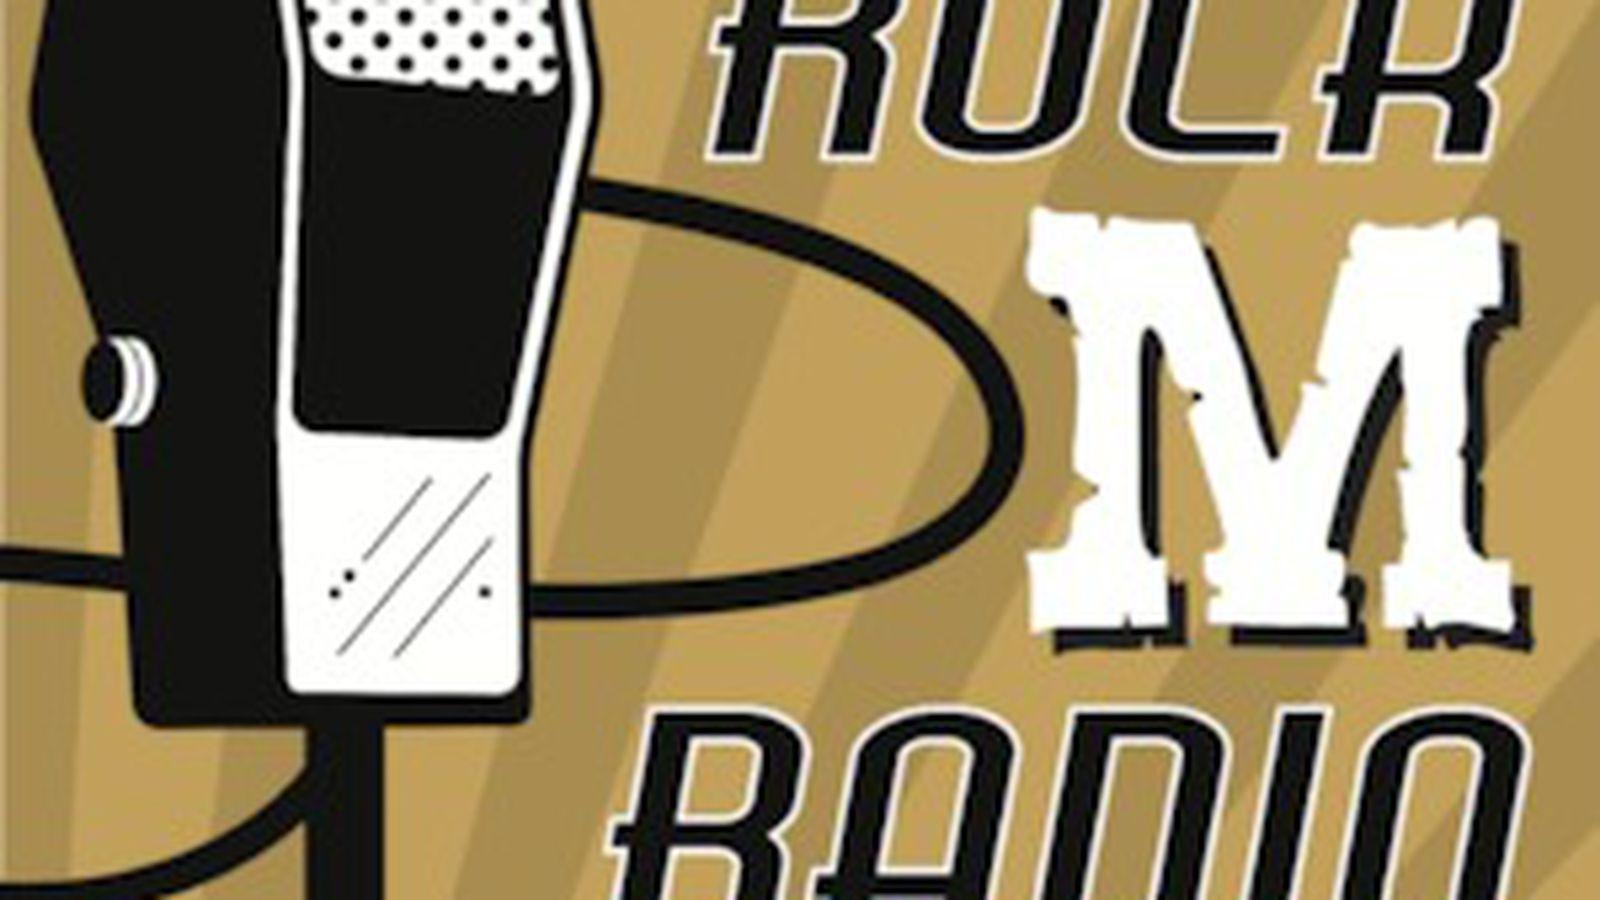 Rock_m_radio_logo.0